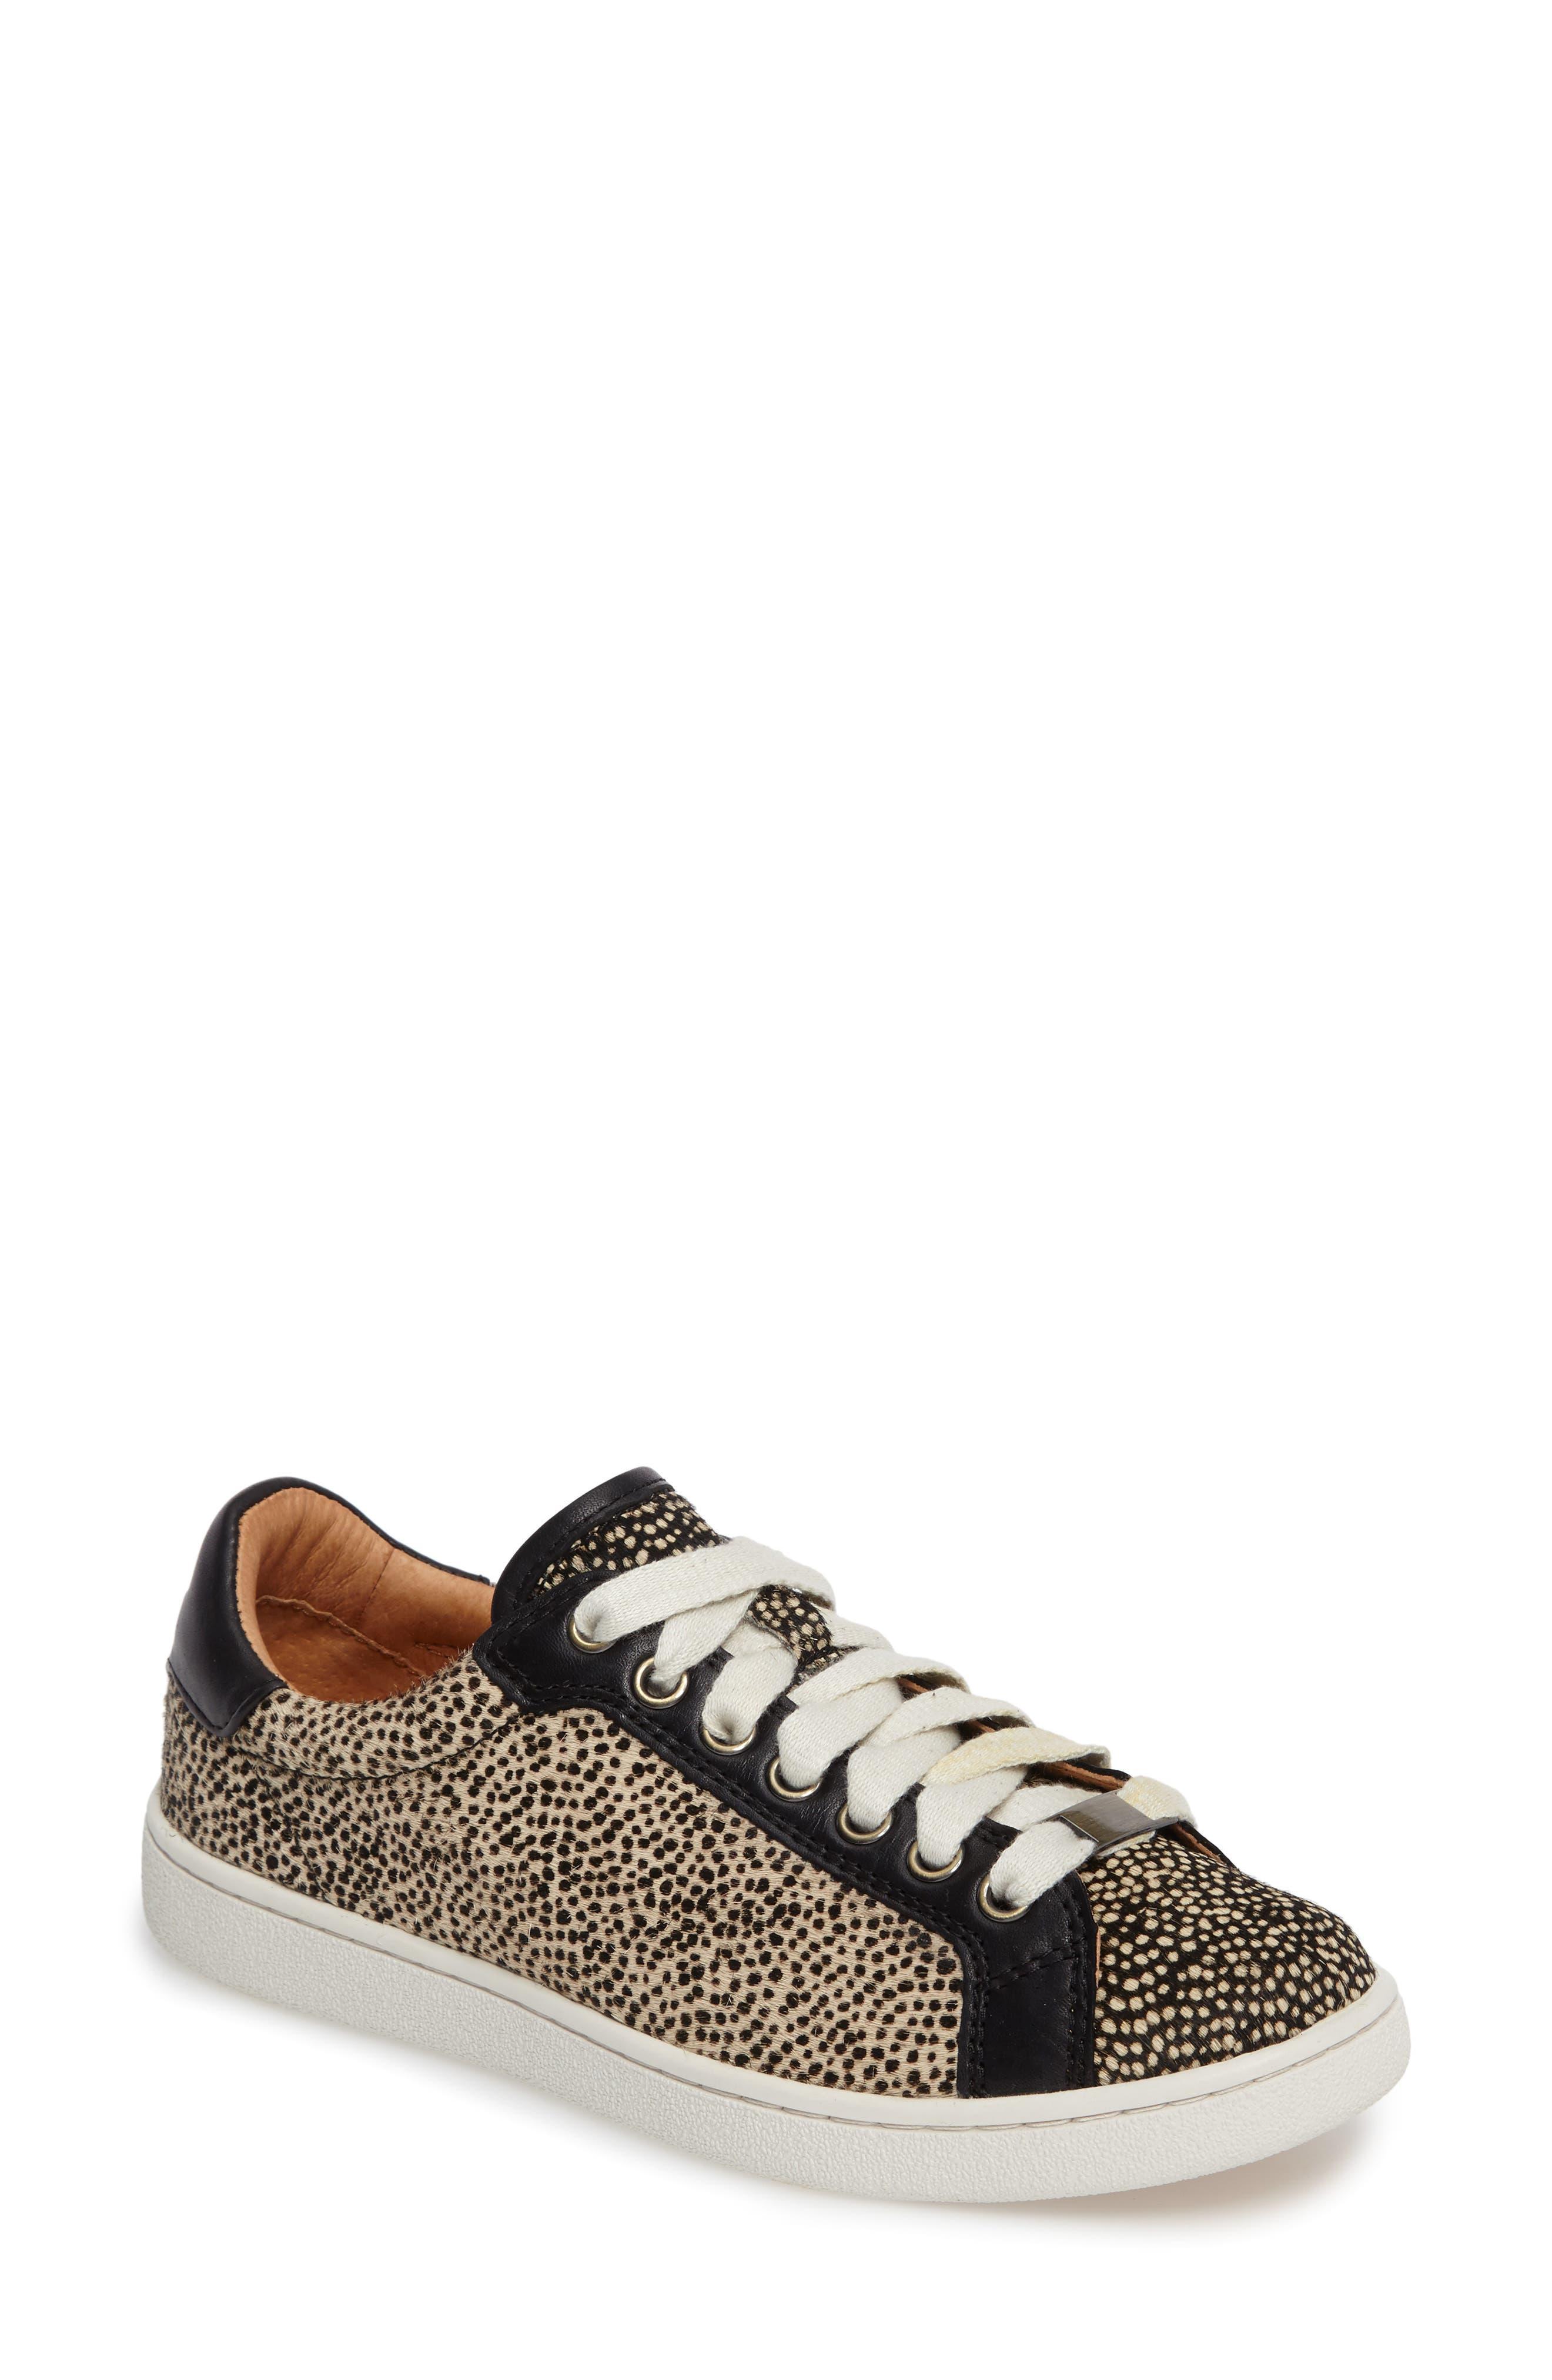 Main Image - UGG® Milo Genuine Calf Hair Sneaker (Women)